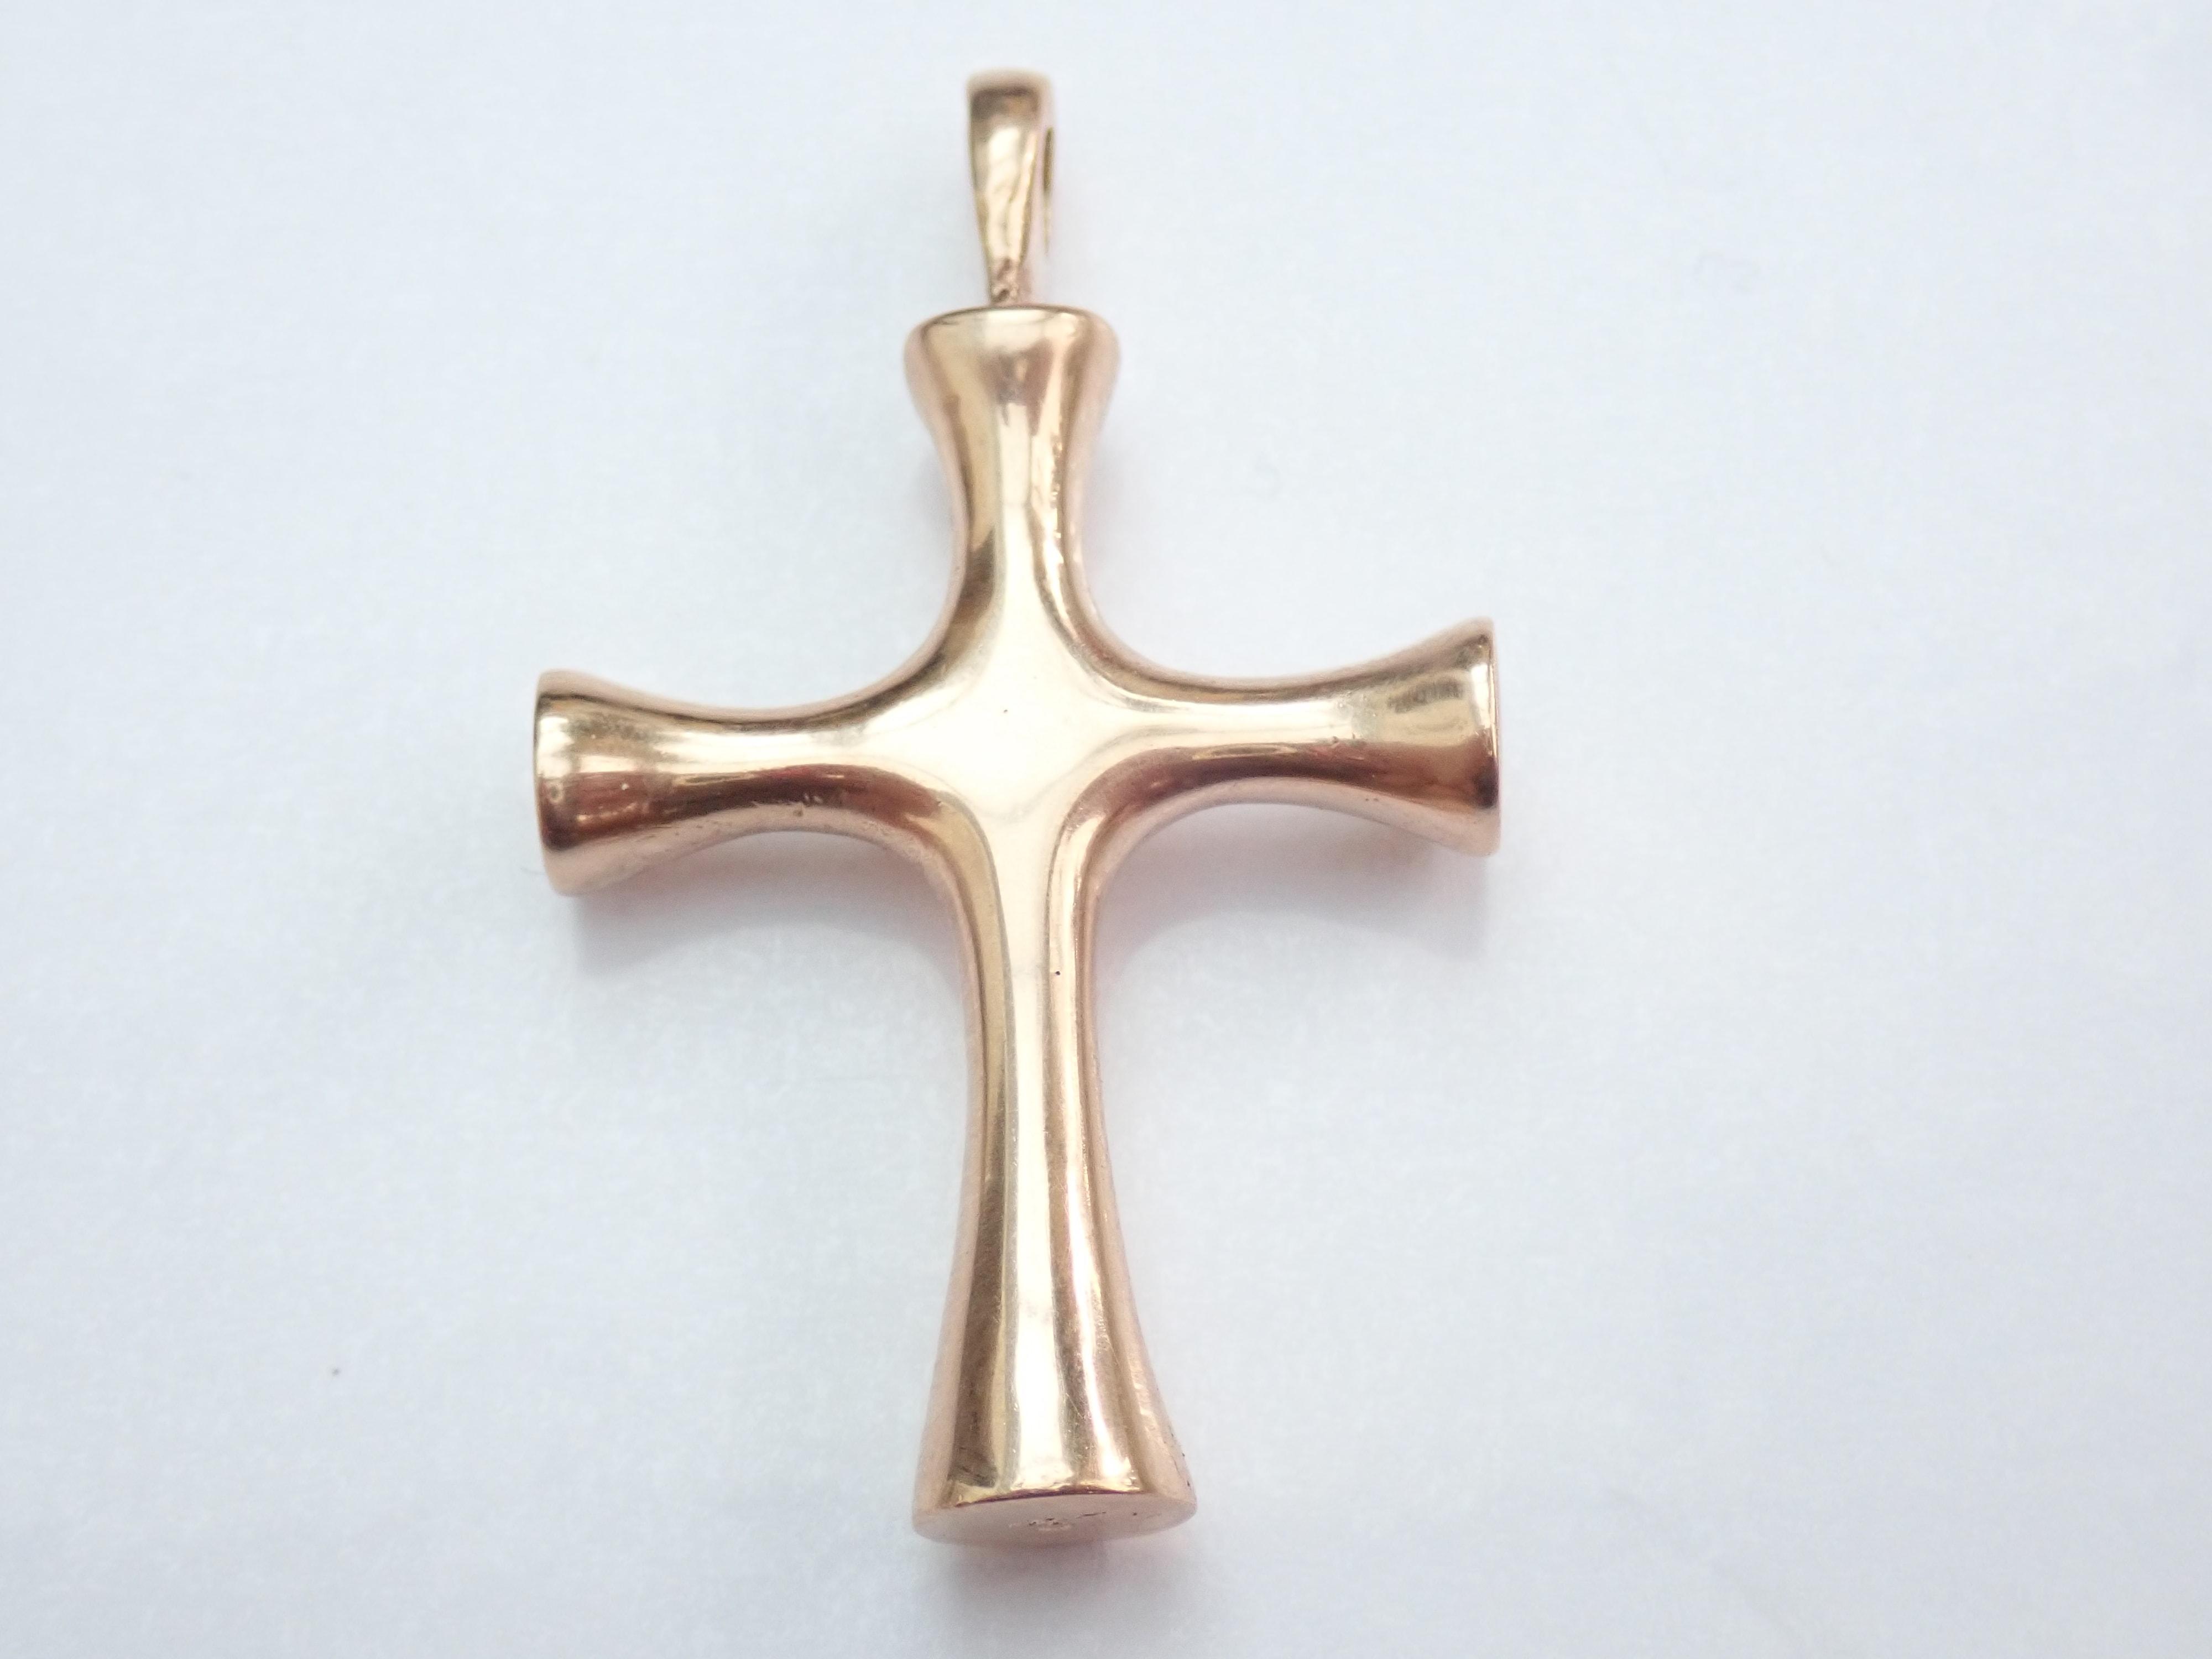 9K Gold Cross Crucifix Pendant No Chain 8.85gms #145